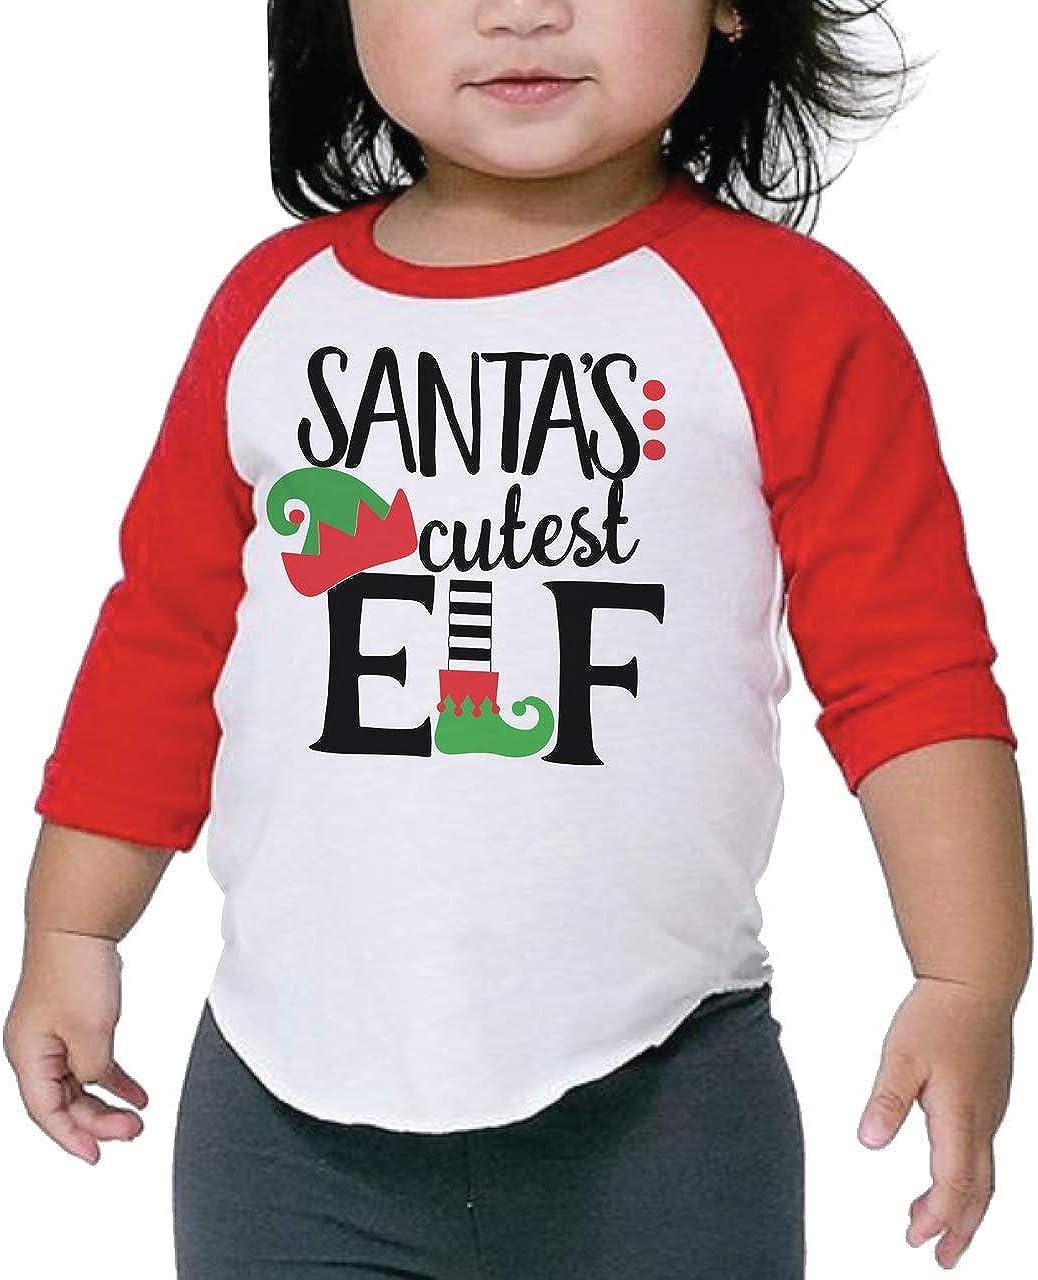 Bump and Beyond Designs Kids Santa's Cutest Elf Shirt